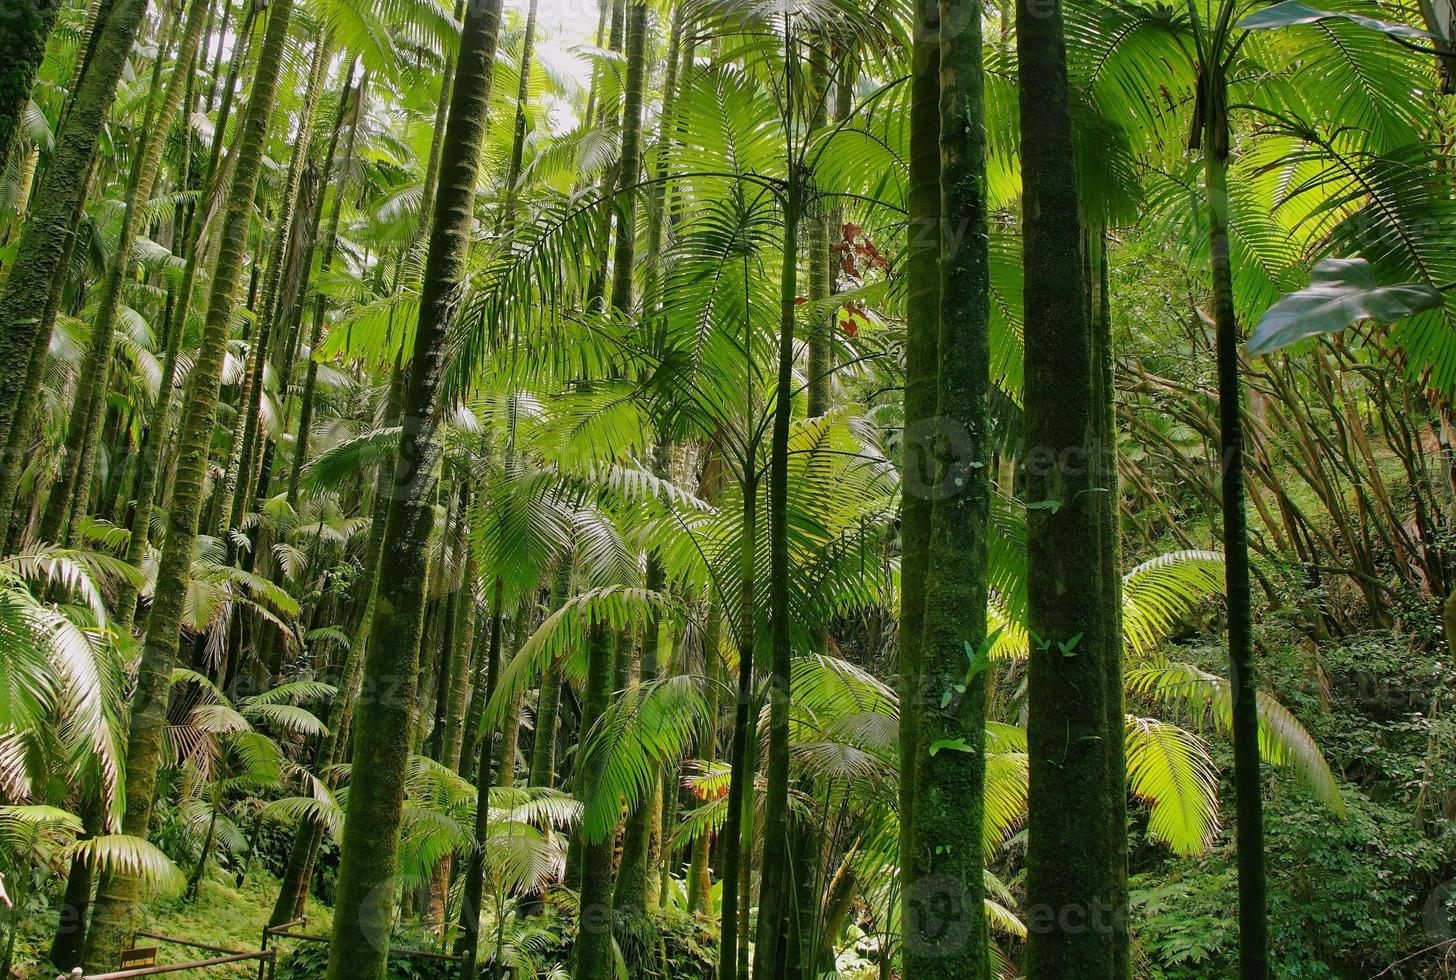 Trees in Hawaii tropical botanical garden photo